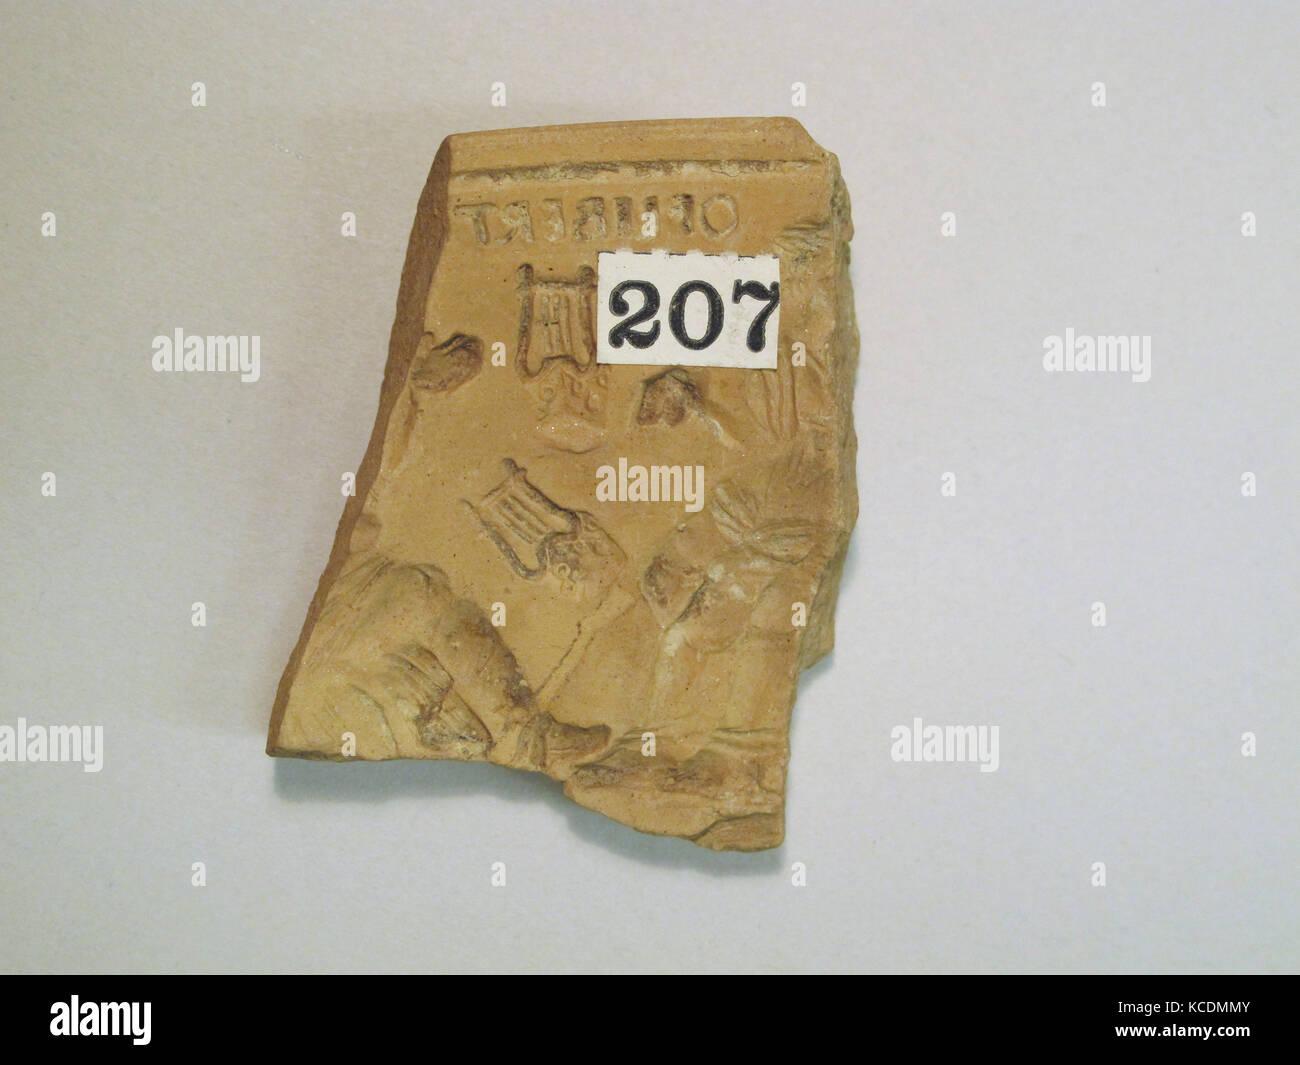 Terracotta mold fragment stock photos & terracotta mold fragment